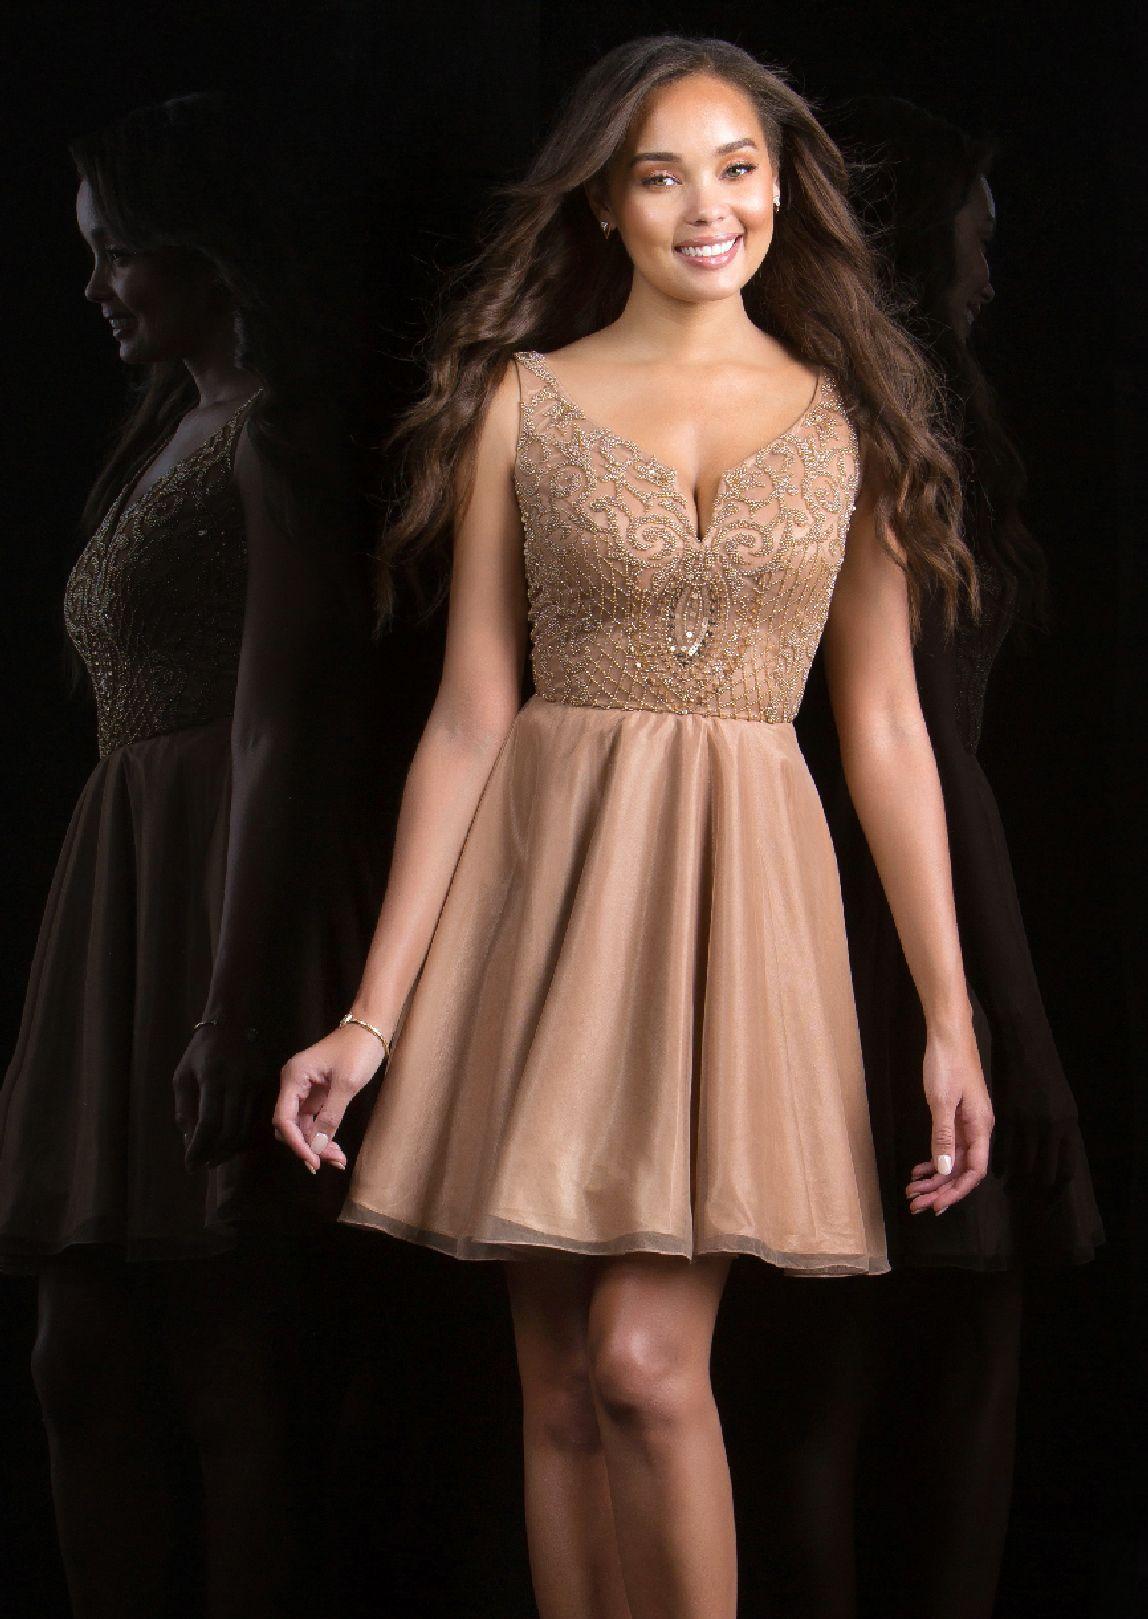 Prom dresses evening dresses by scalaucbrueascucbrueillusion sheer